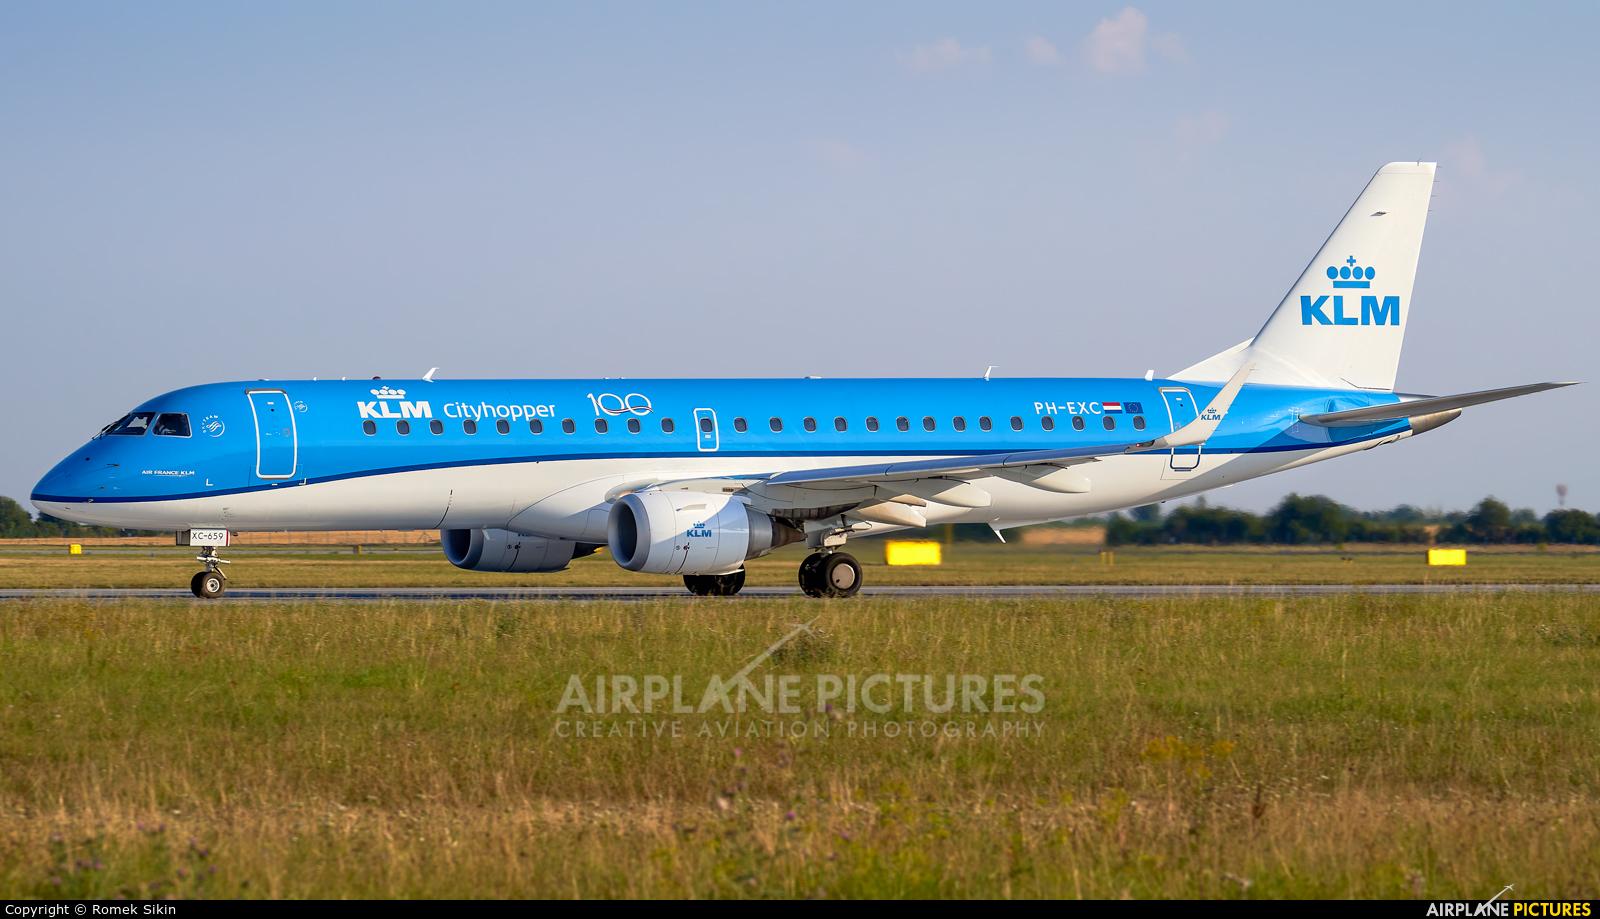 KLM Cityhopper PH-EXC aircraft at Prague - Václav Havel